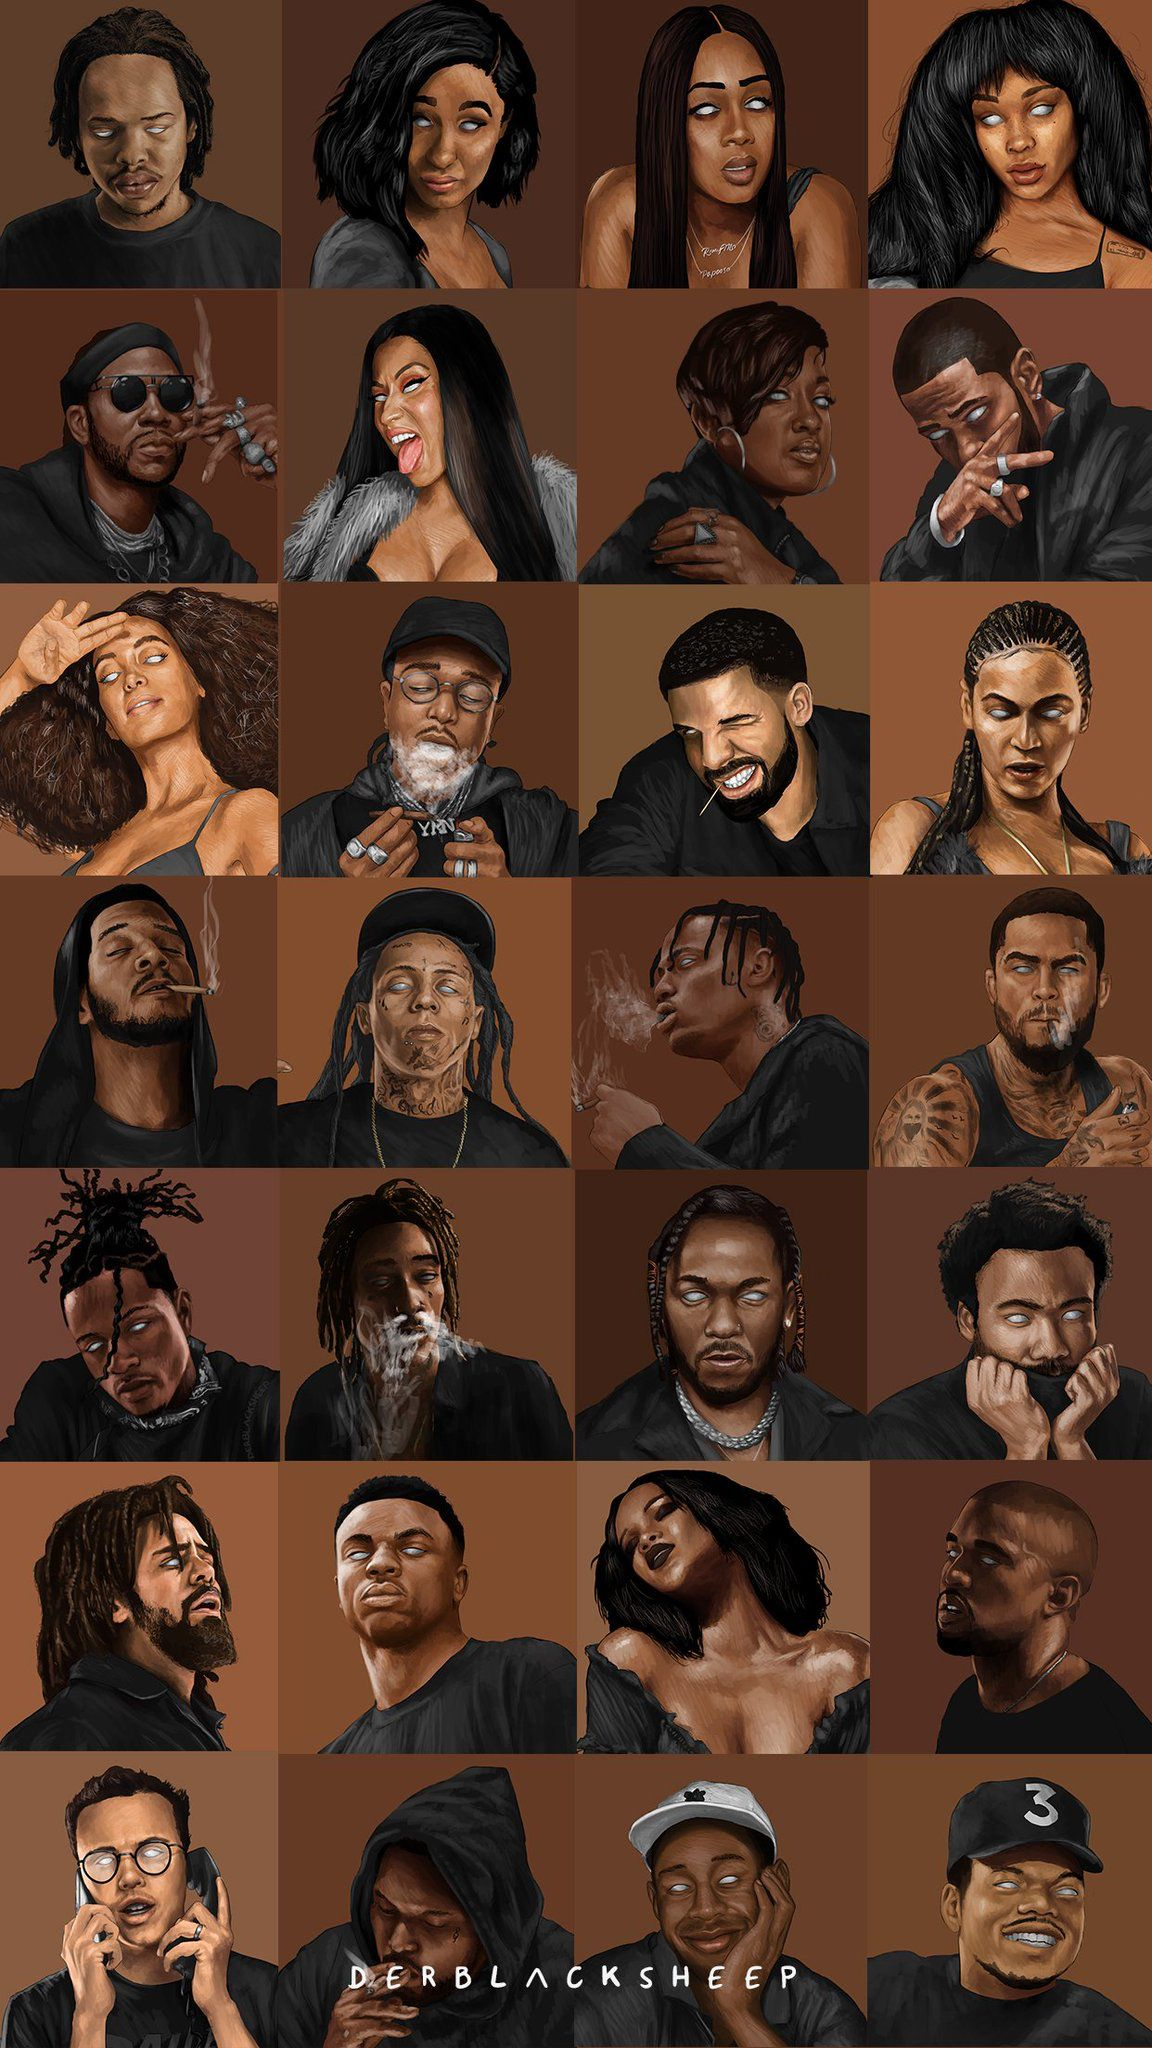 Artist DerBlackSheep Rapper